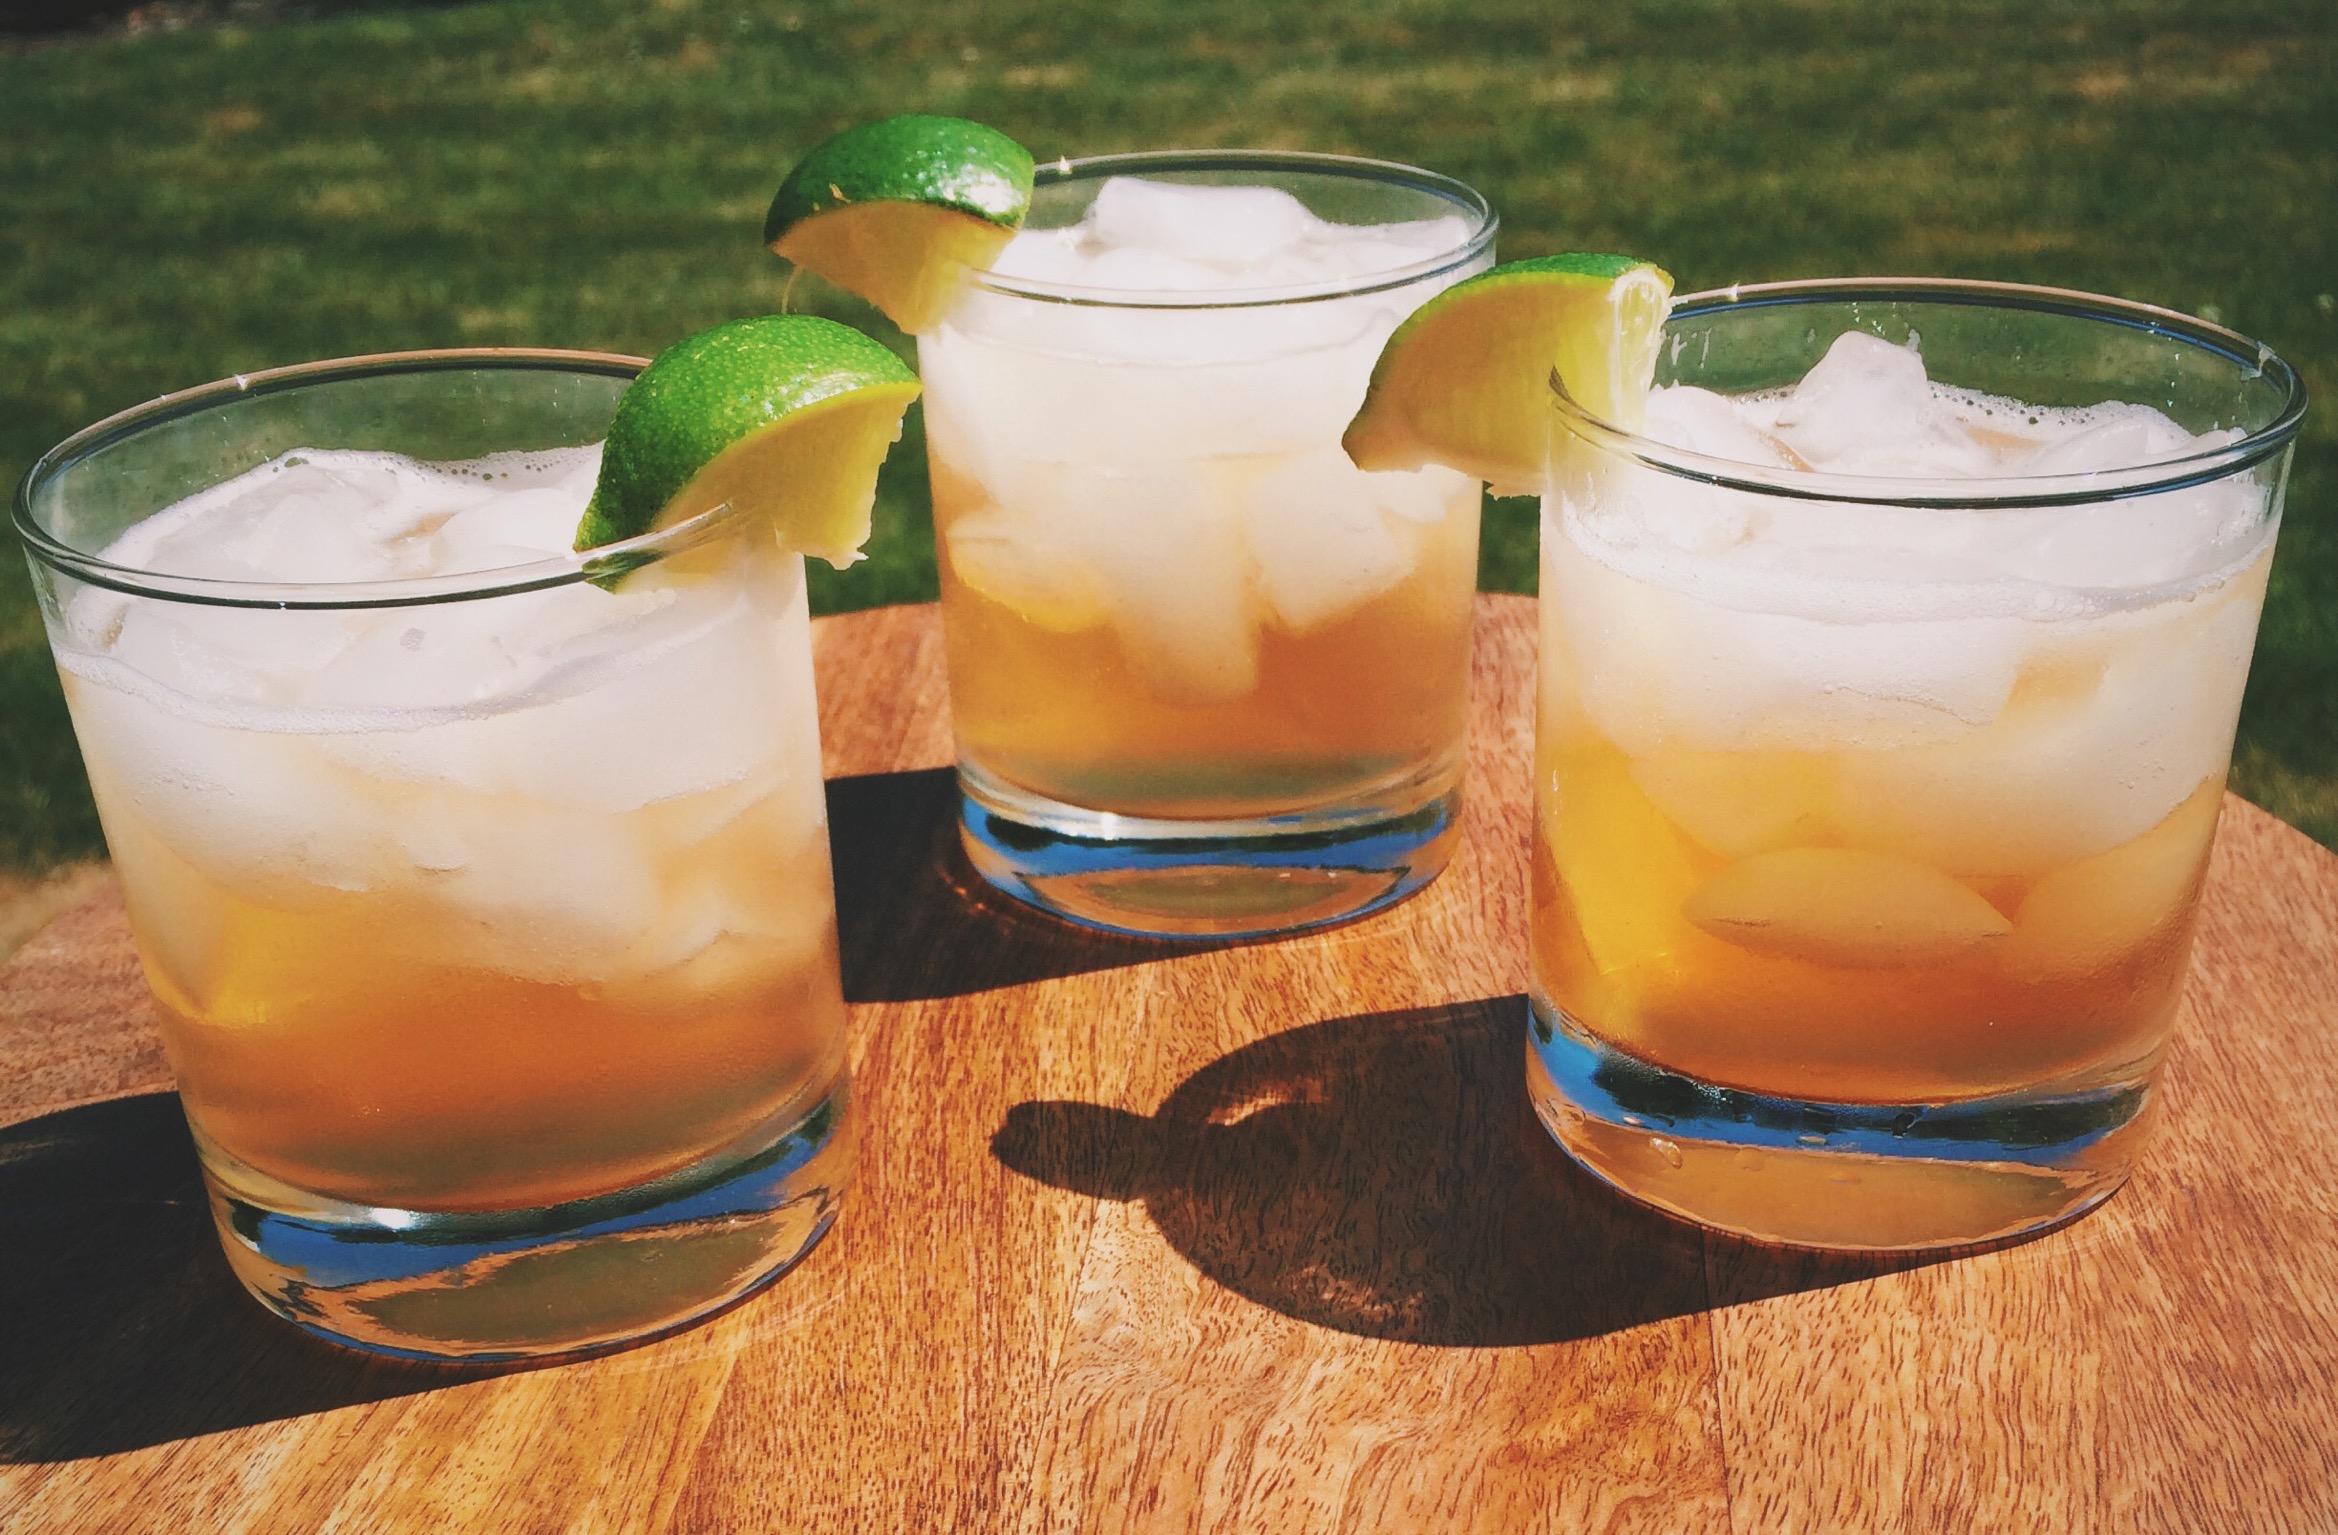 & TONIC creates perfect craft cocktails